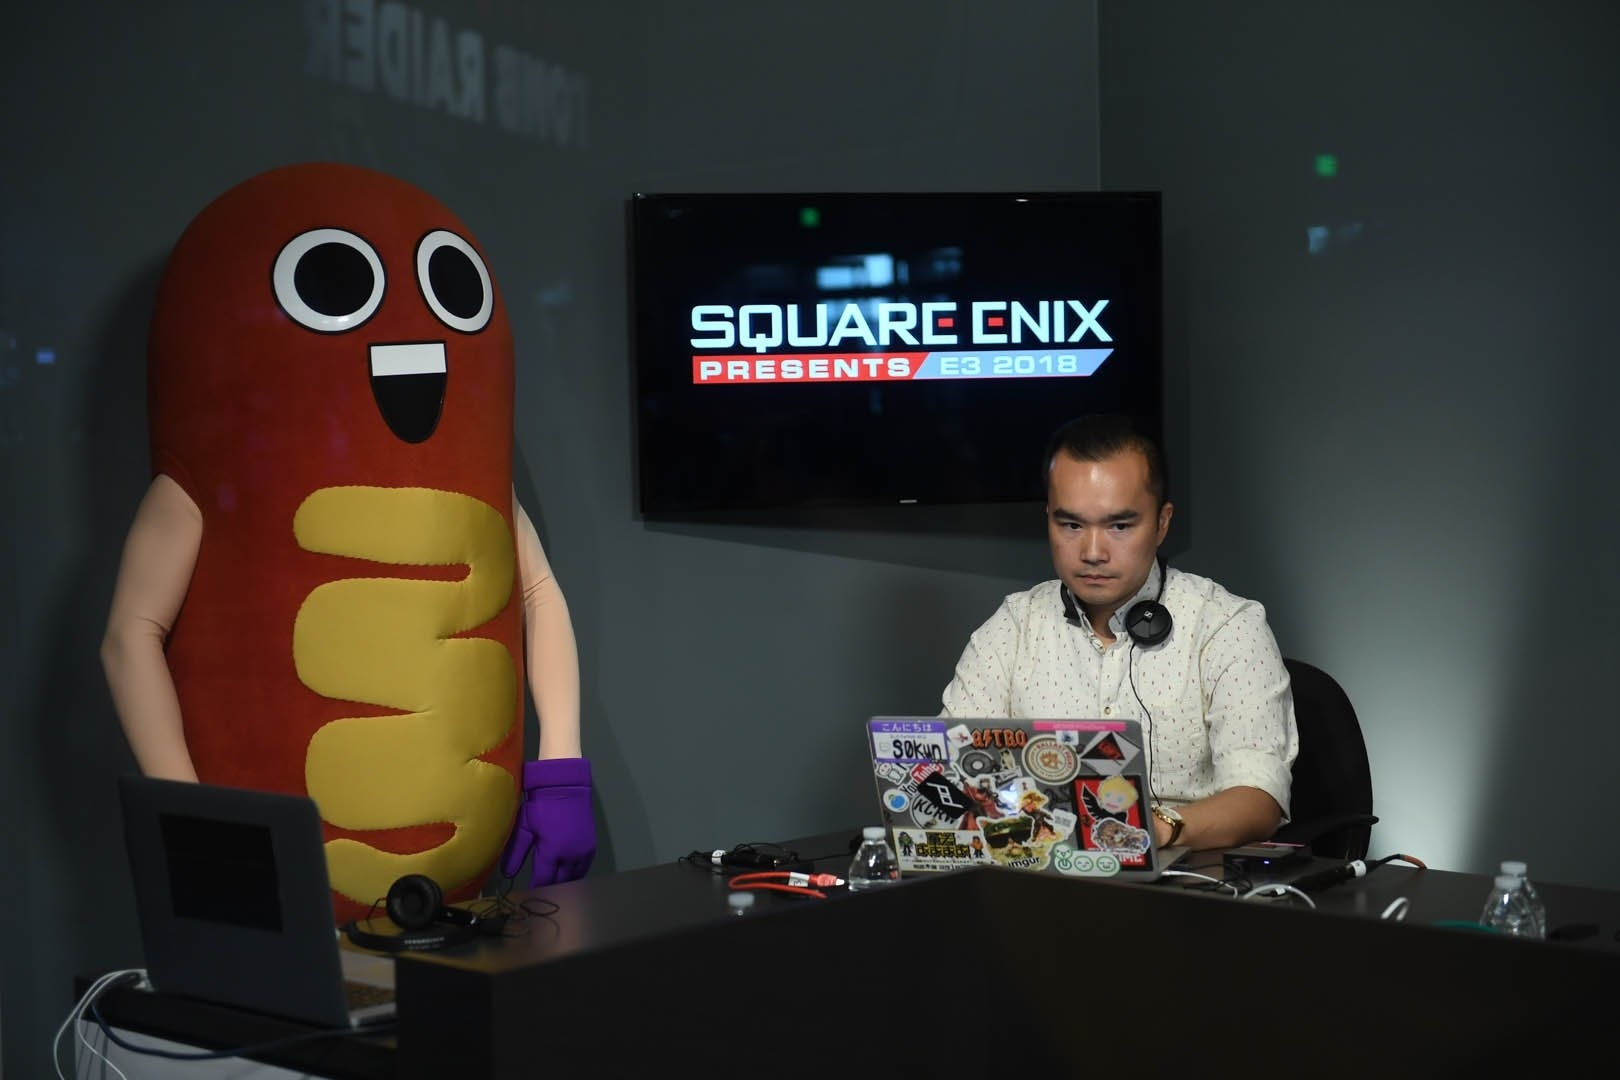 Сосисыч во время стрима на Twitch-канале Square Enix Presents